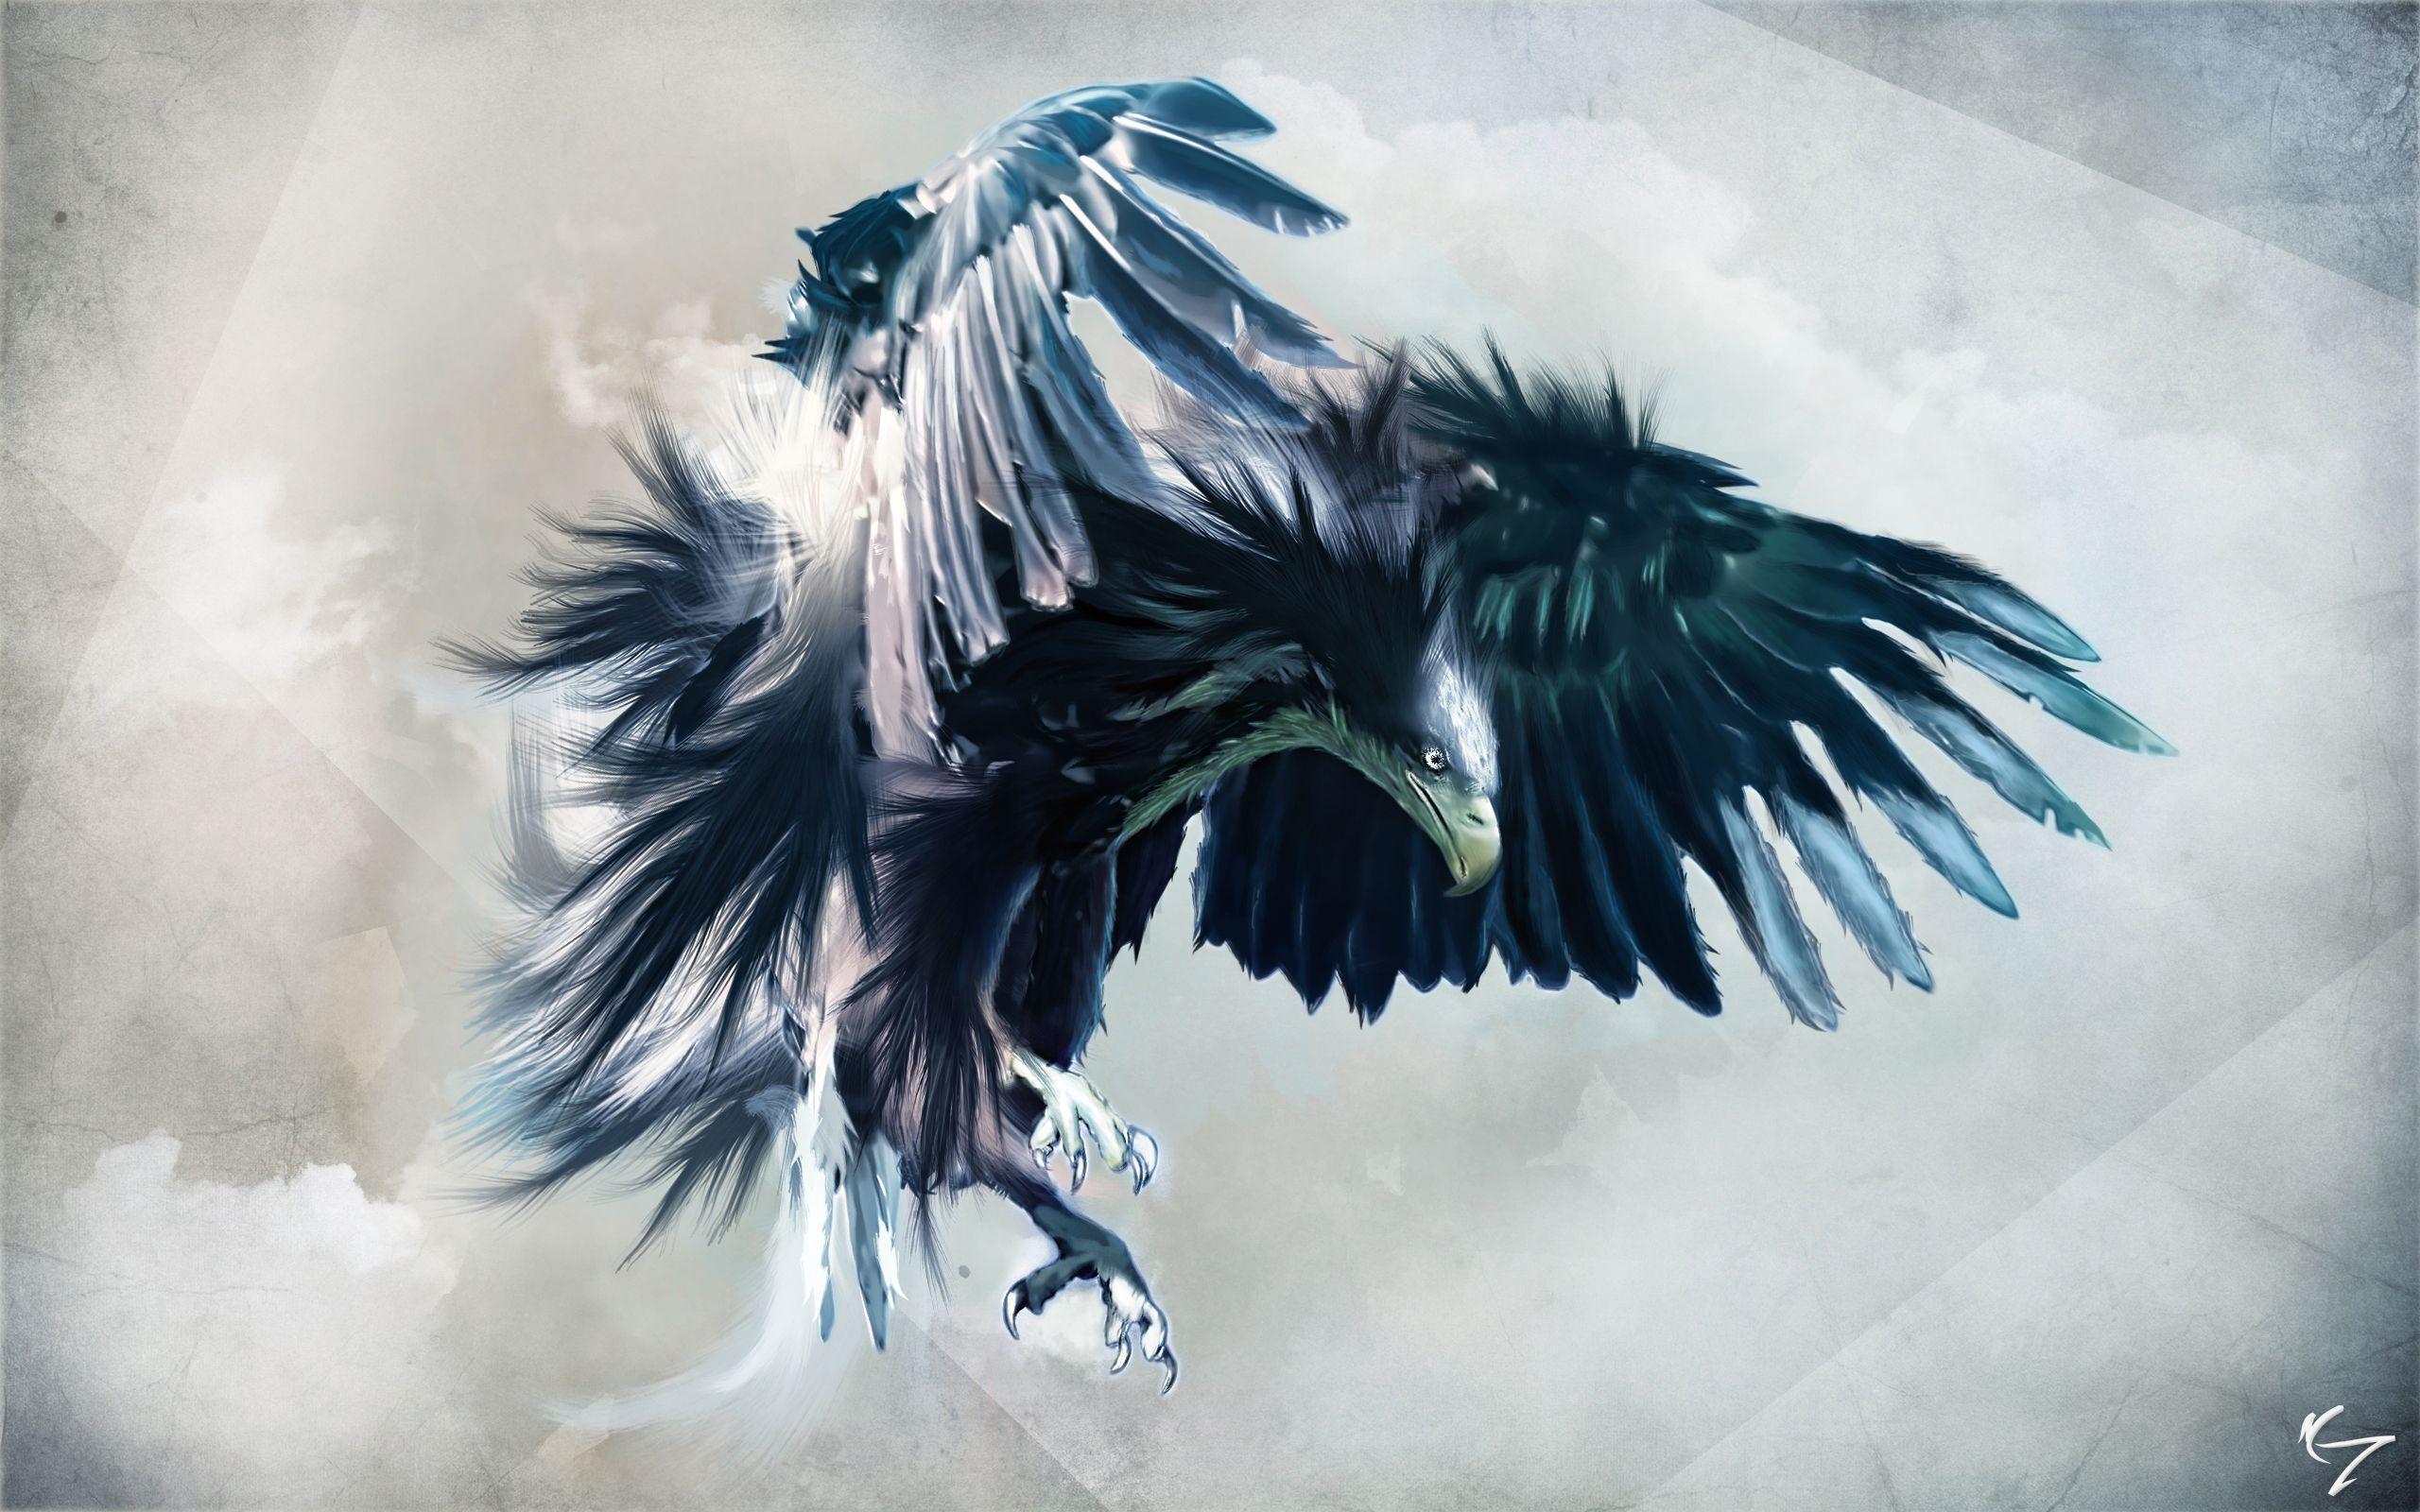 Eagle Computer Wallpapers, Desktop Backgrounds | 2560x1600 | ID:418497